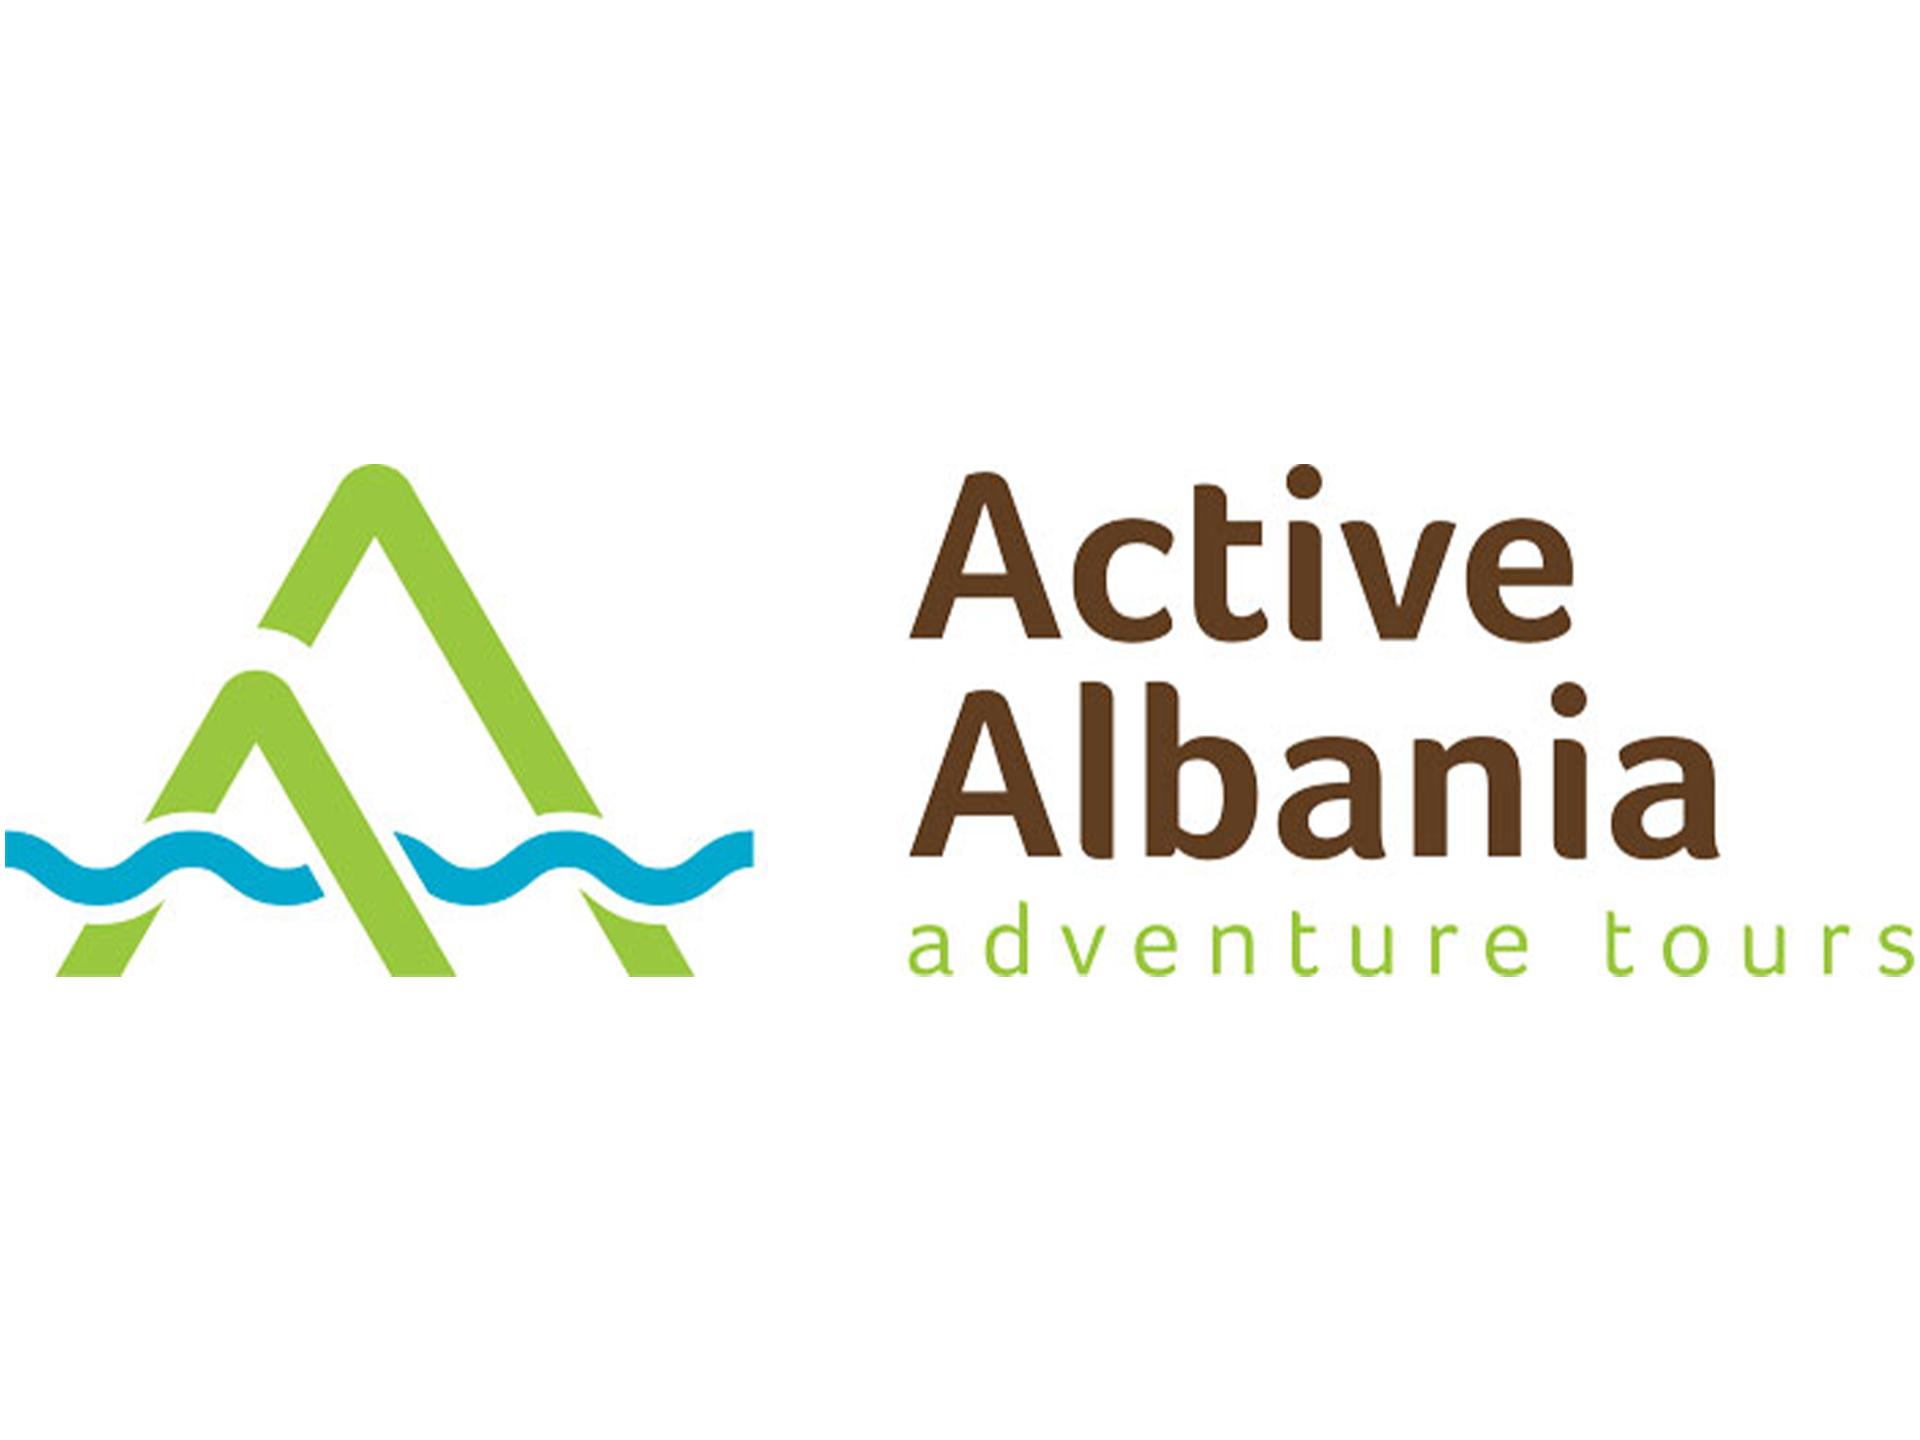 active-albania-logo.jpg